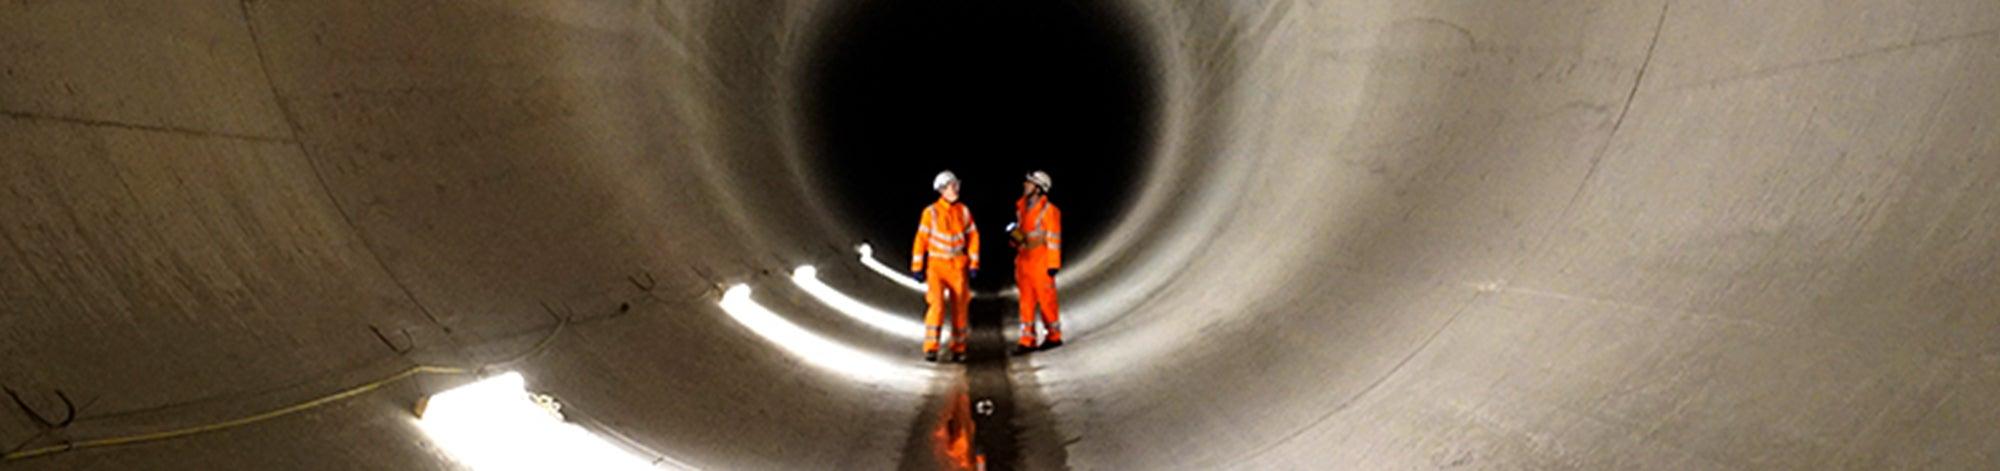 Lee Tunnel - BBC Super Sewer series - Tom Swingler (Raw TV Ltd)